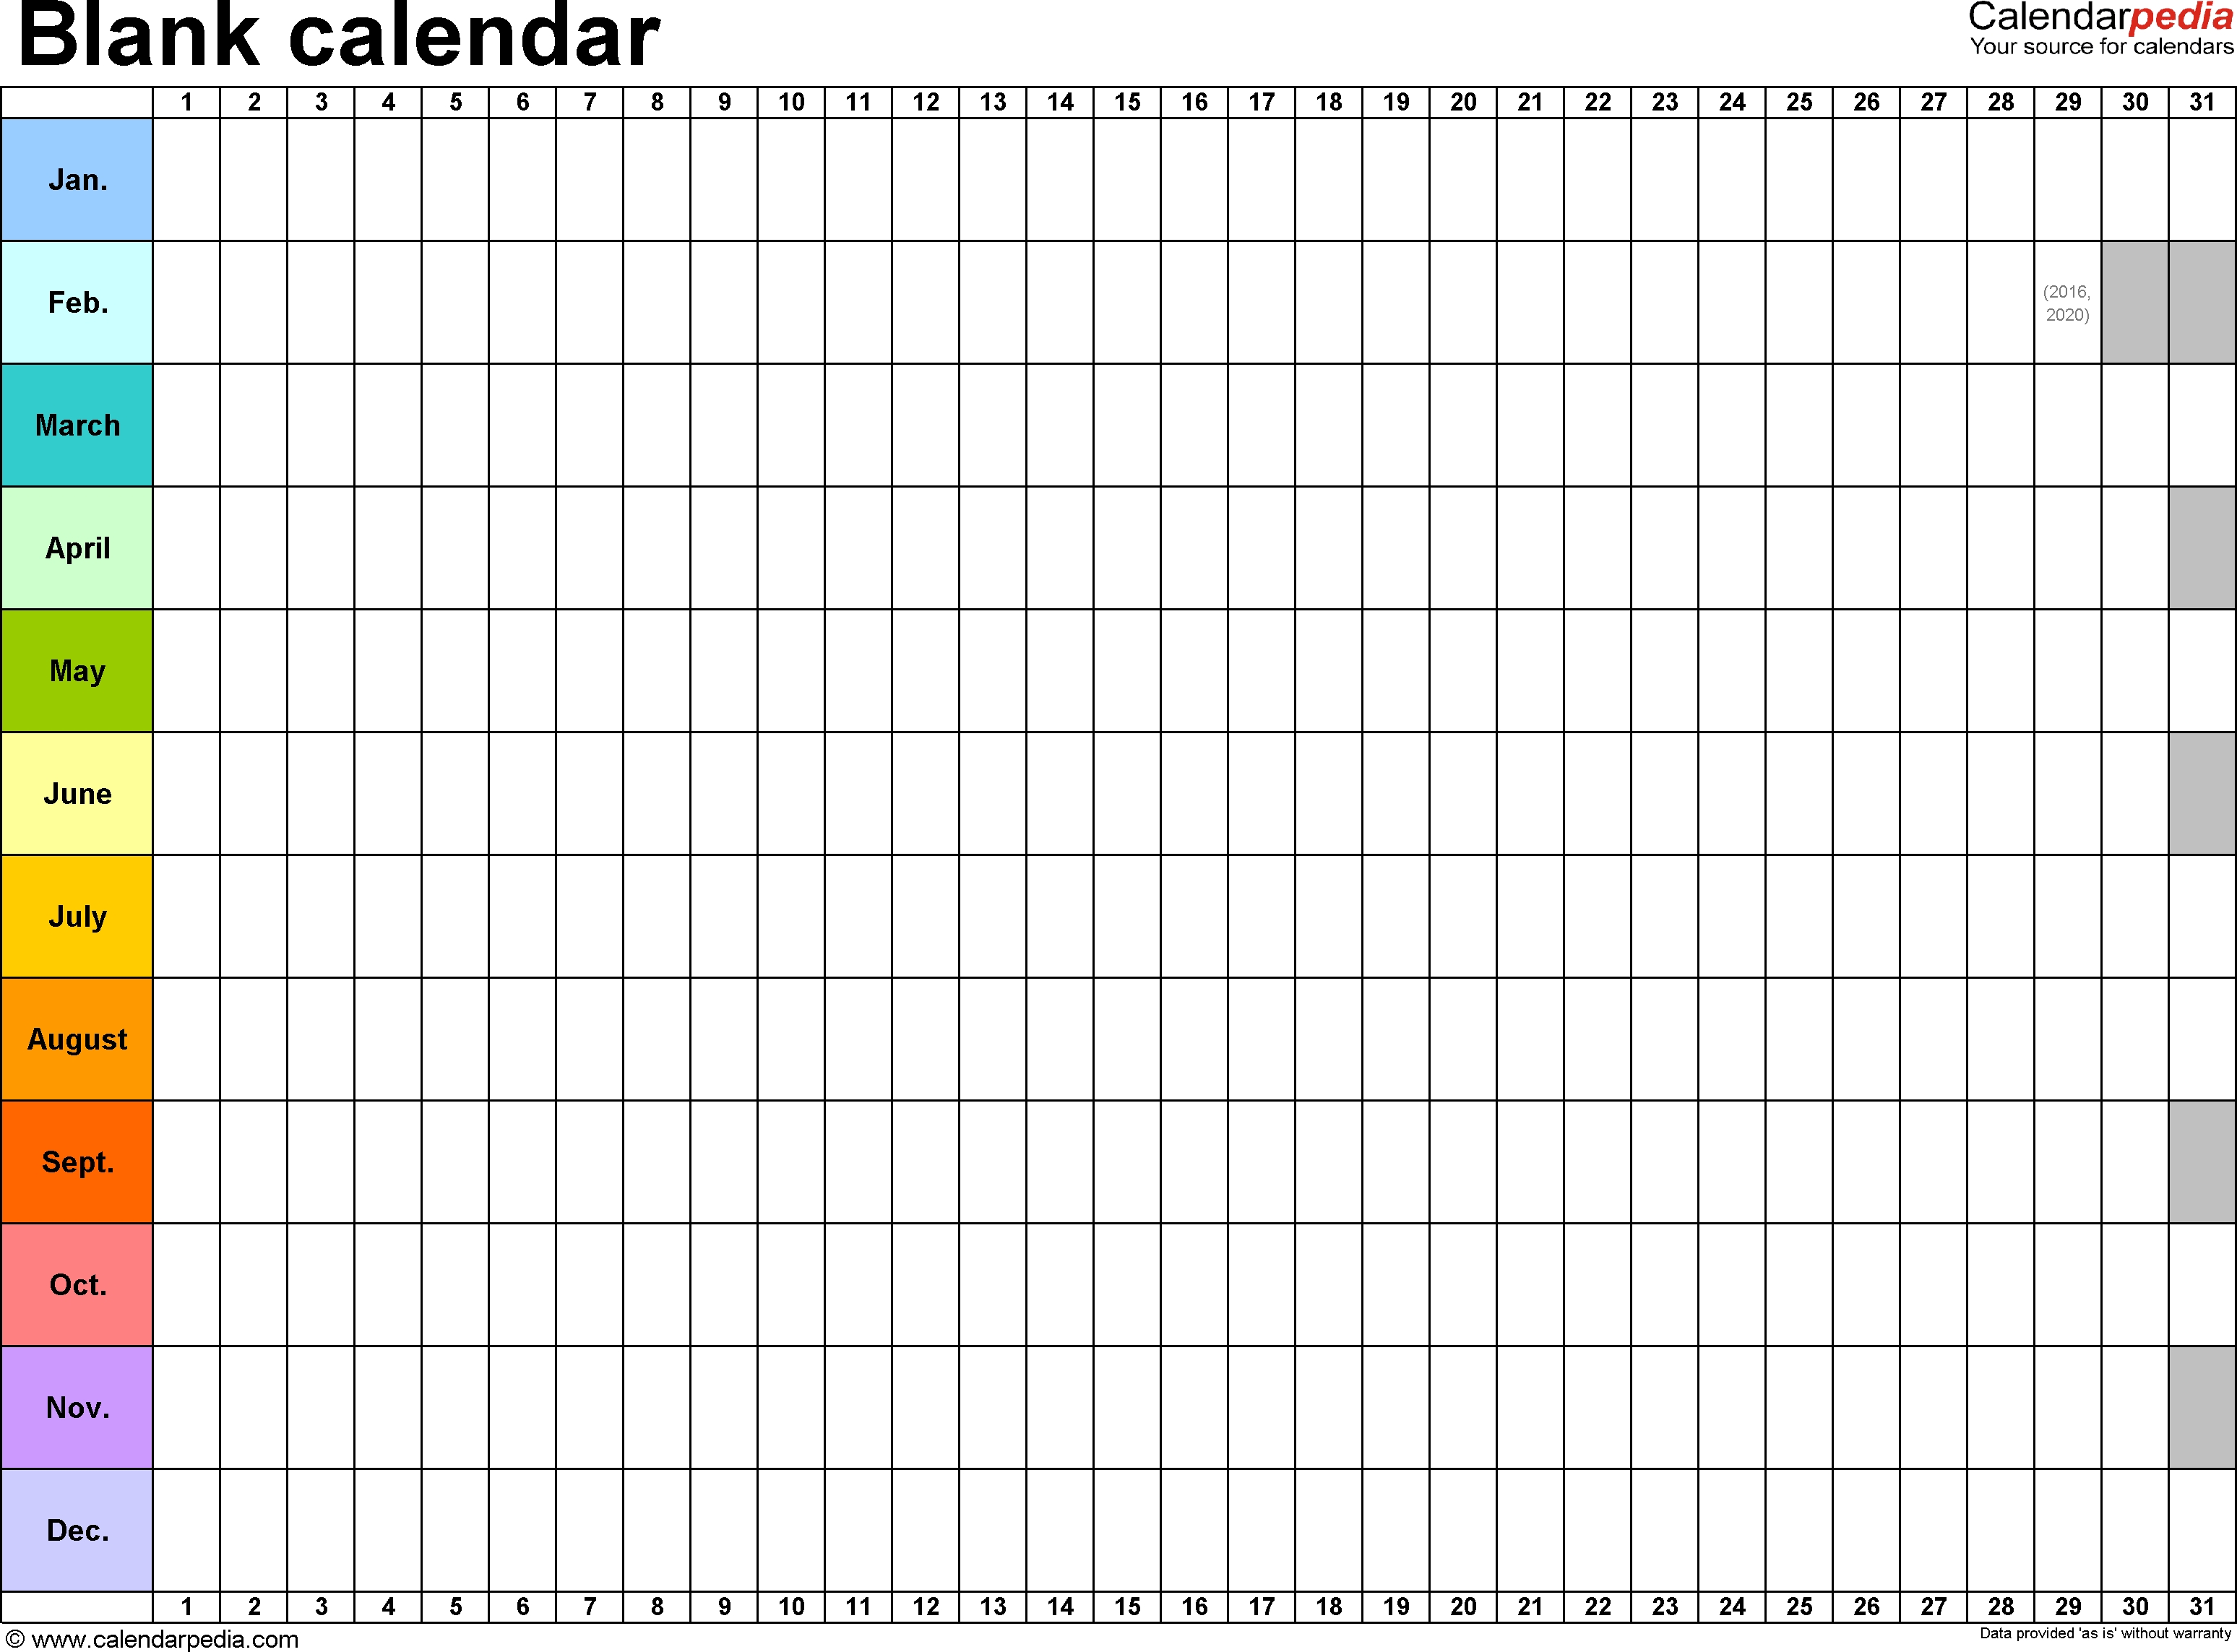 Blank Calendar - 9 Free Printable Microsoft Word Templates regarding Fill In Calendar Template Printable